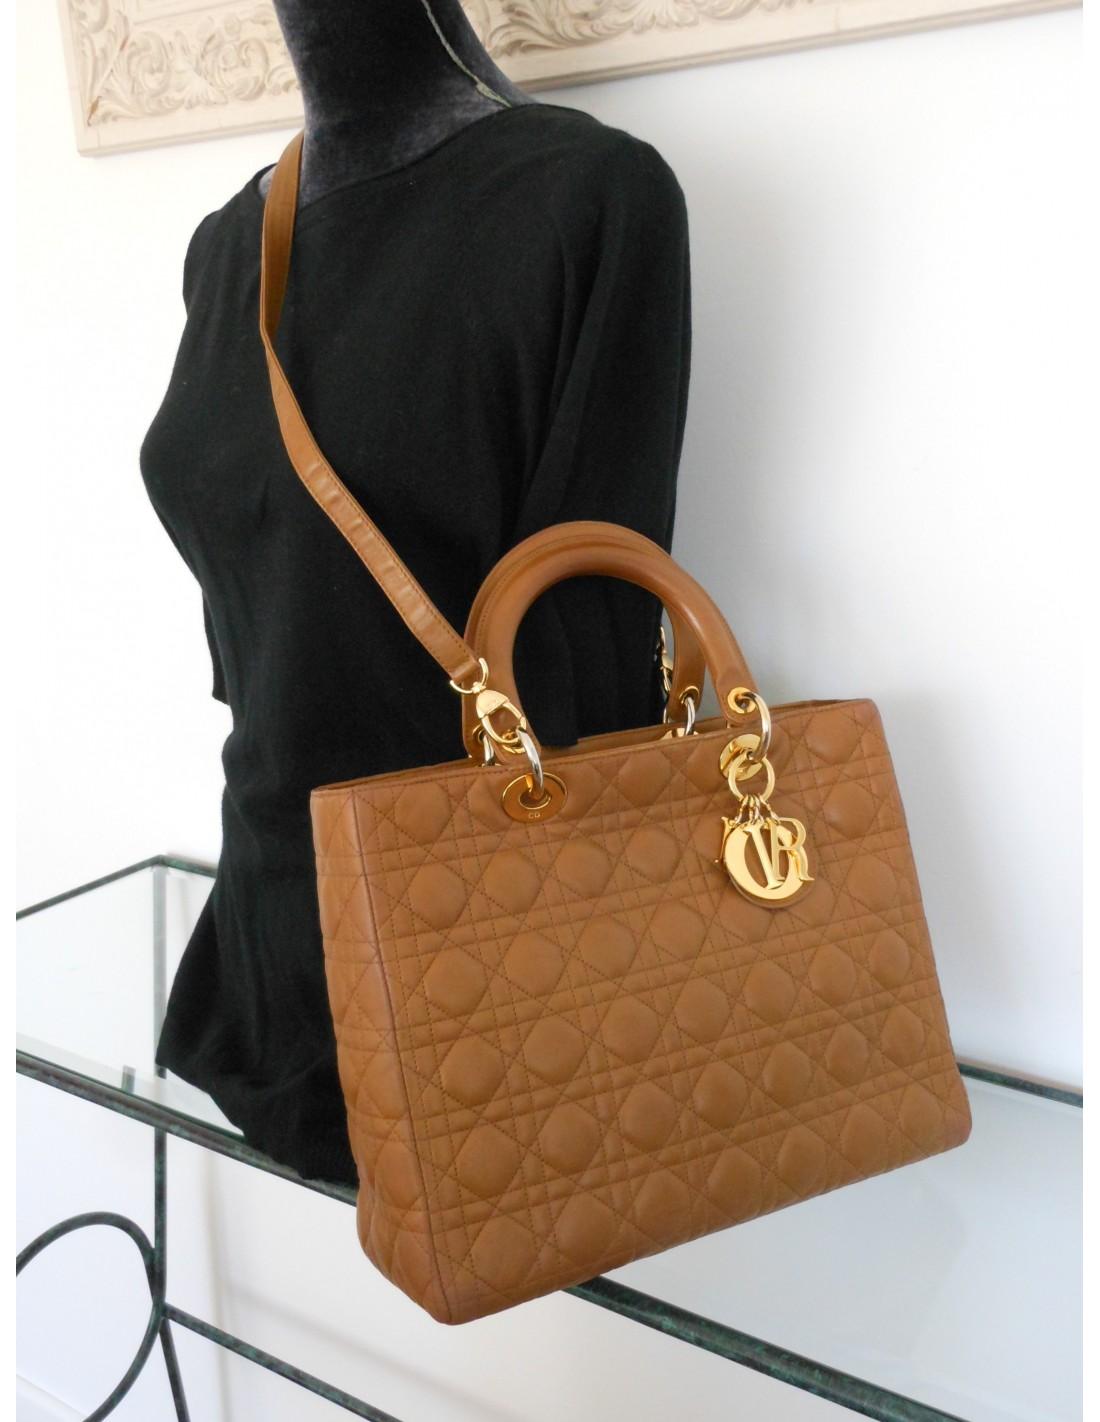 e4e9b48835b SAC LADY DIOR GRAND MODELE - Atoutluxe Boutique